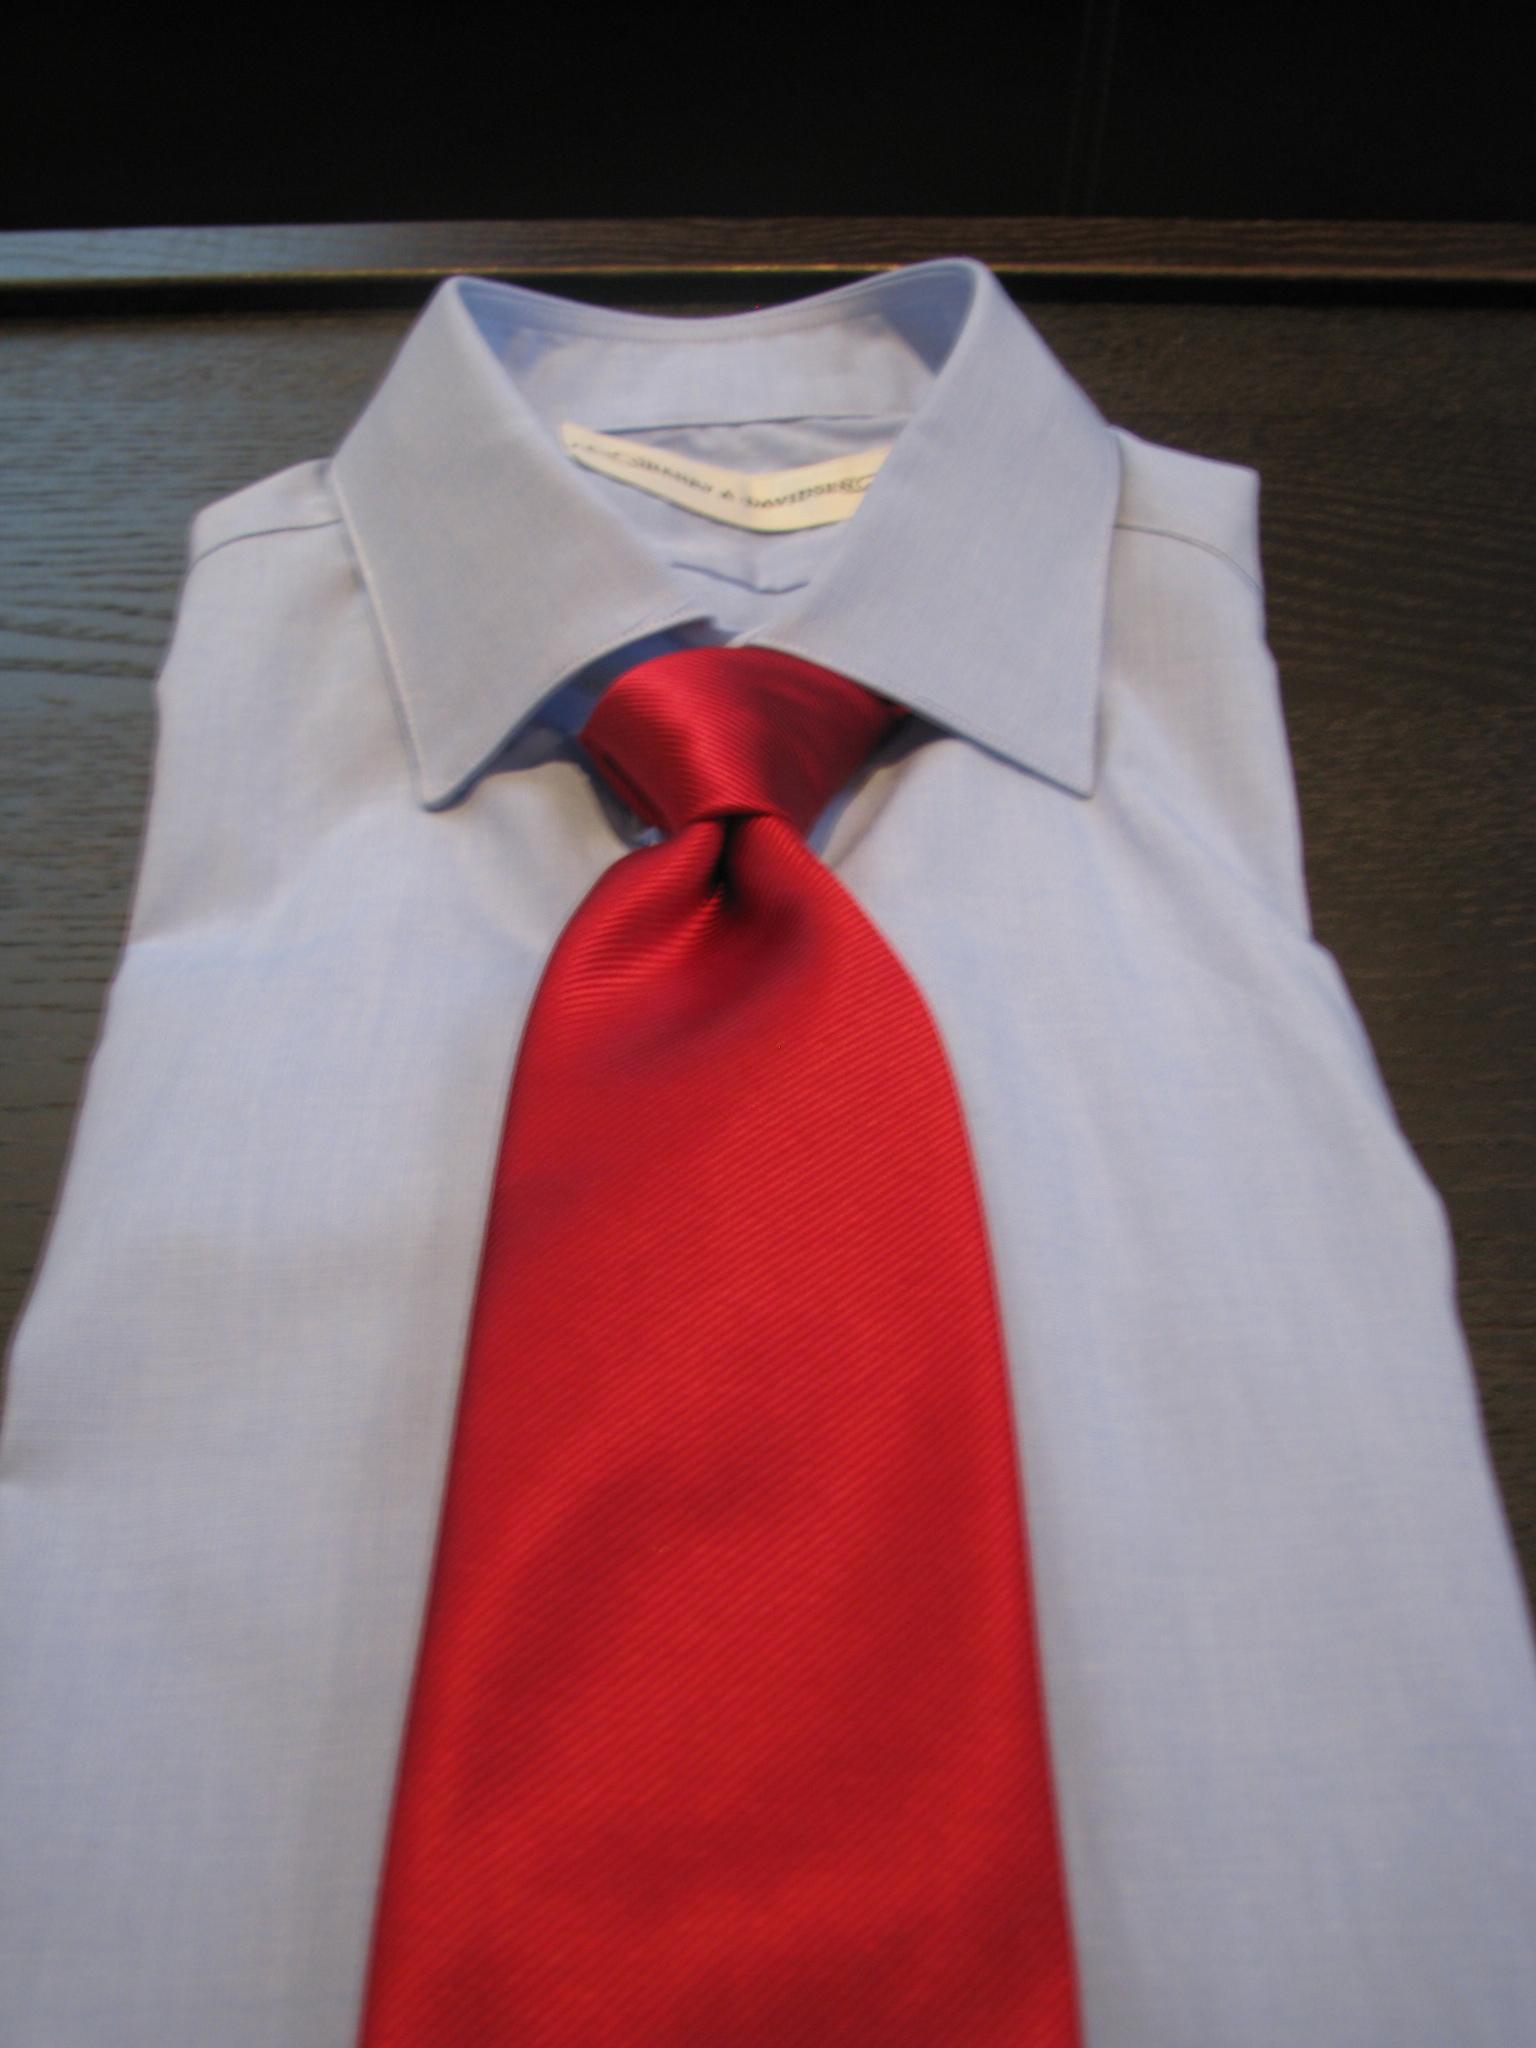 Color Coordination Basics For Suits